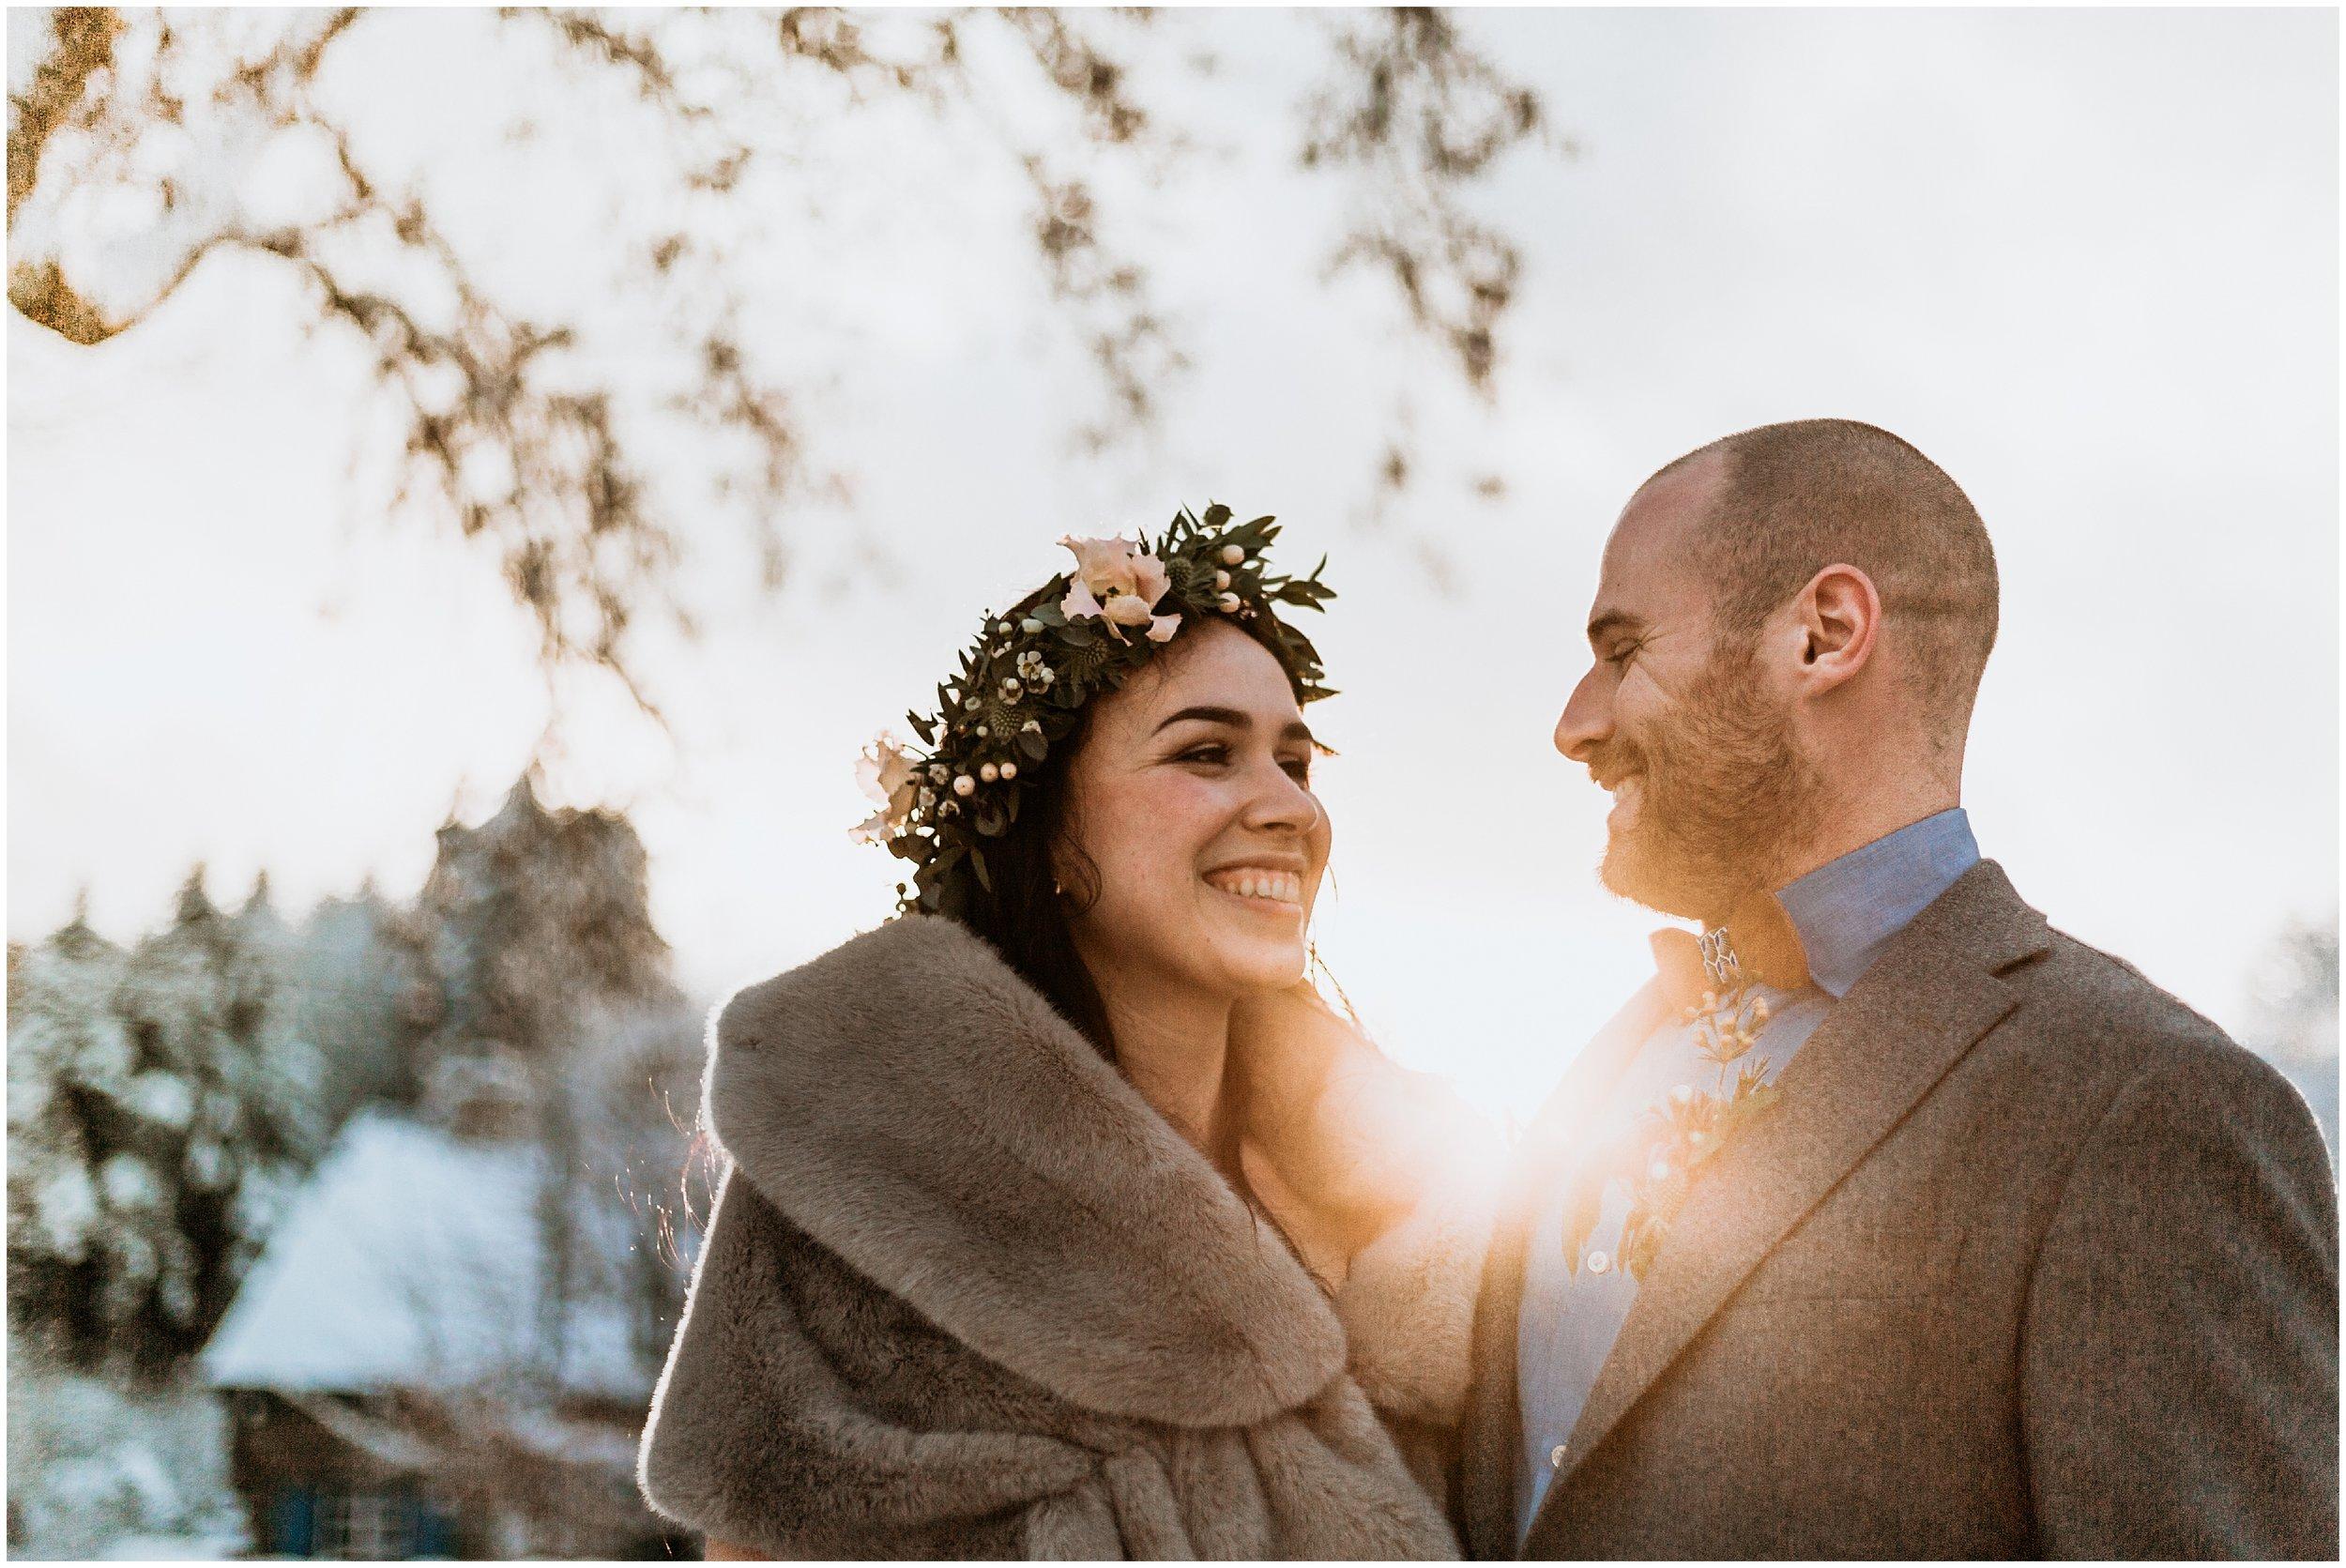 huwelijksfotografie-jana-joeri-ardennen-sechery_0030.jpg